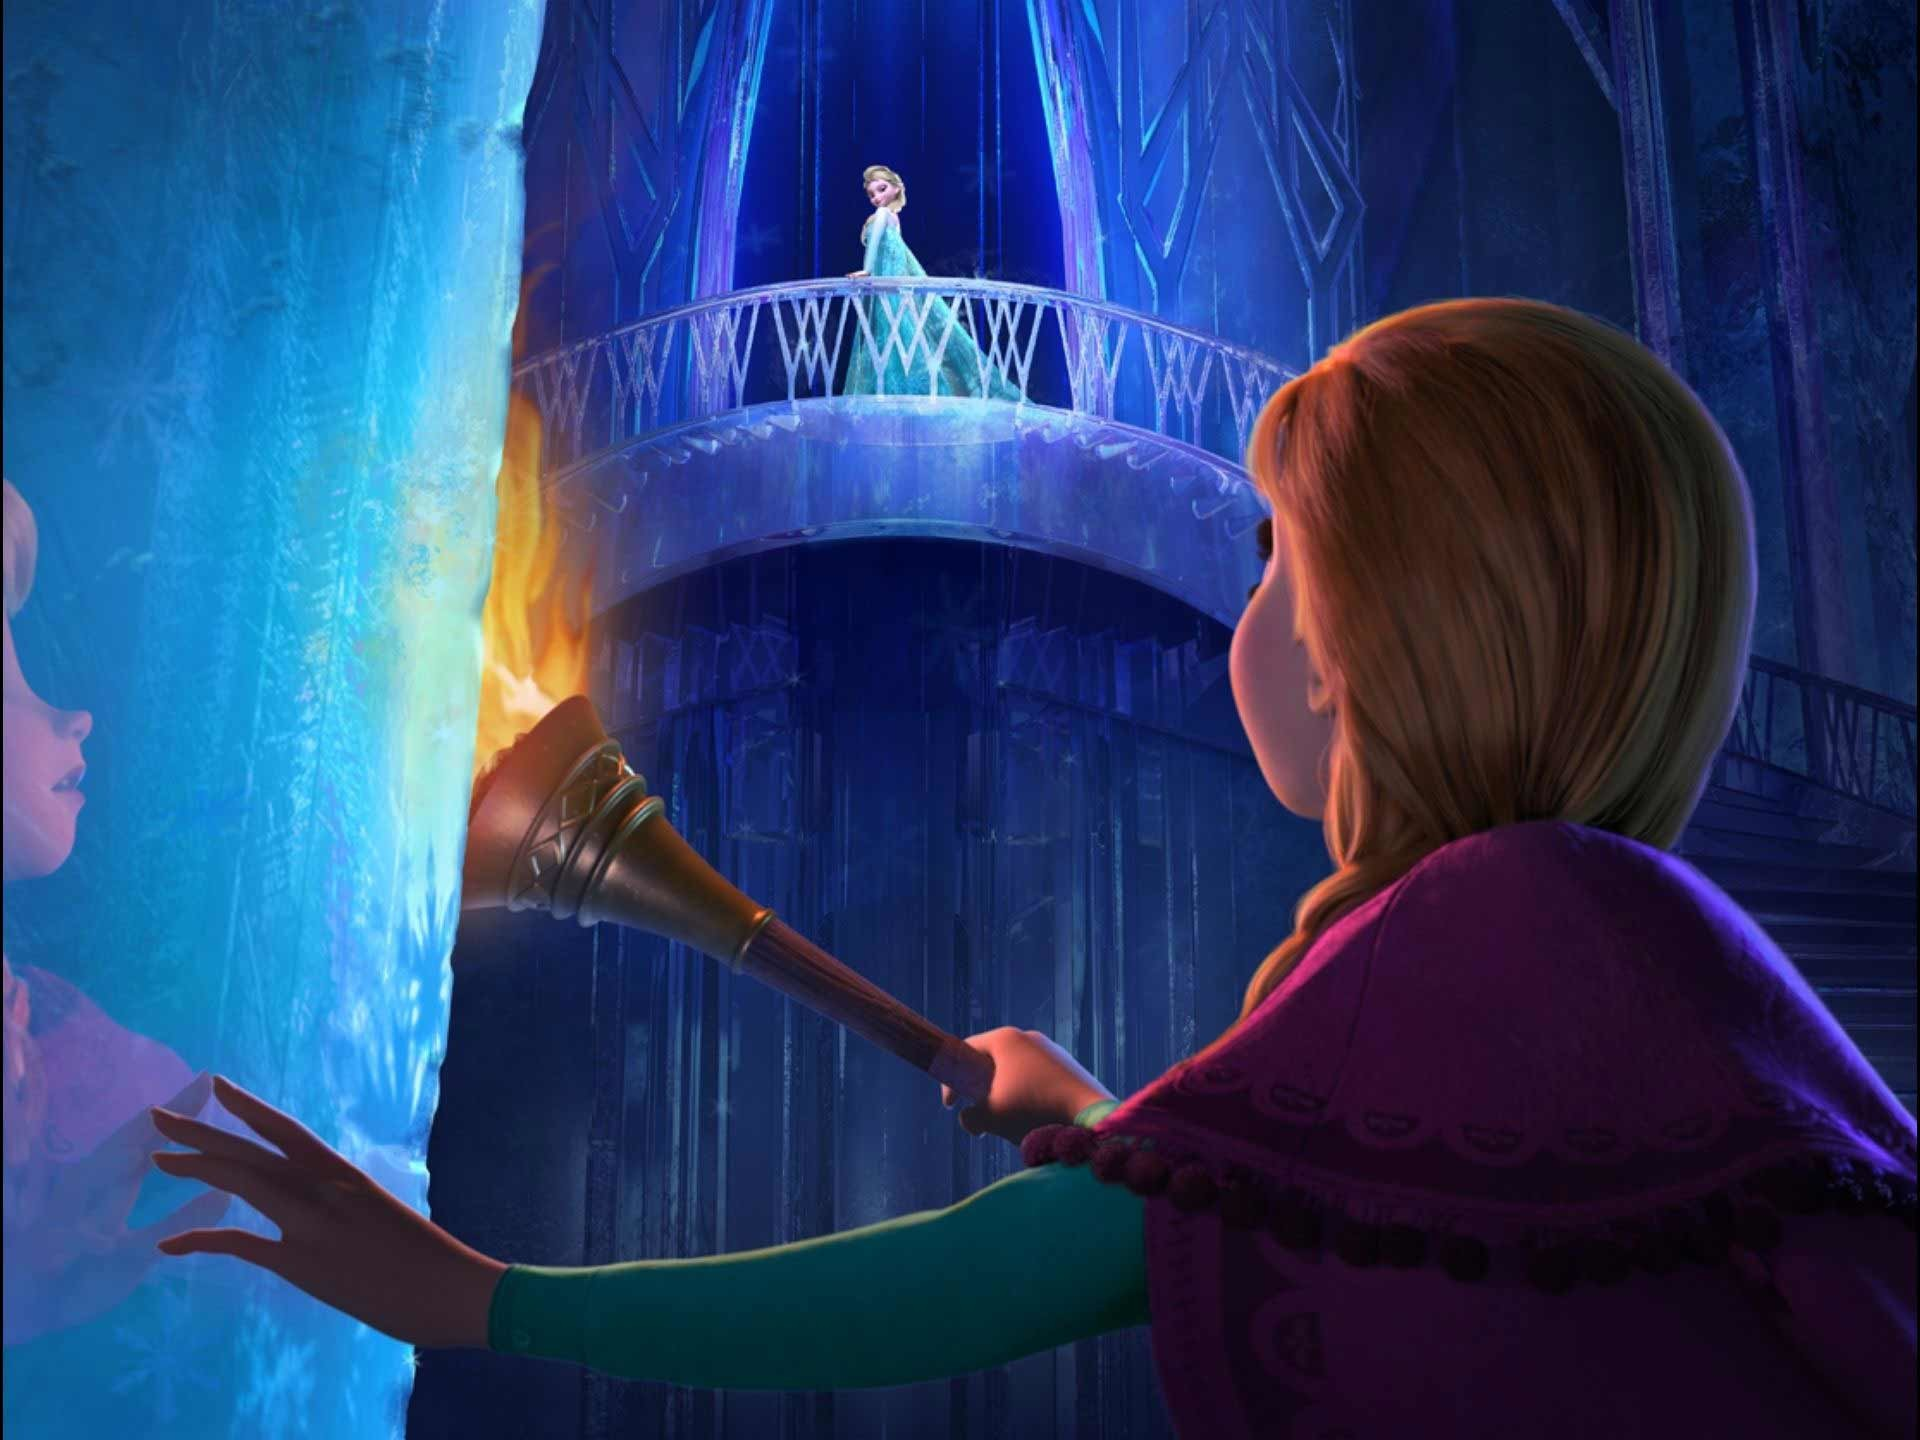 Download. « Disney Movie Gallery Wallpaper · Disney Movie Widescreen  Desktop Wallpaper »